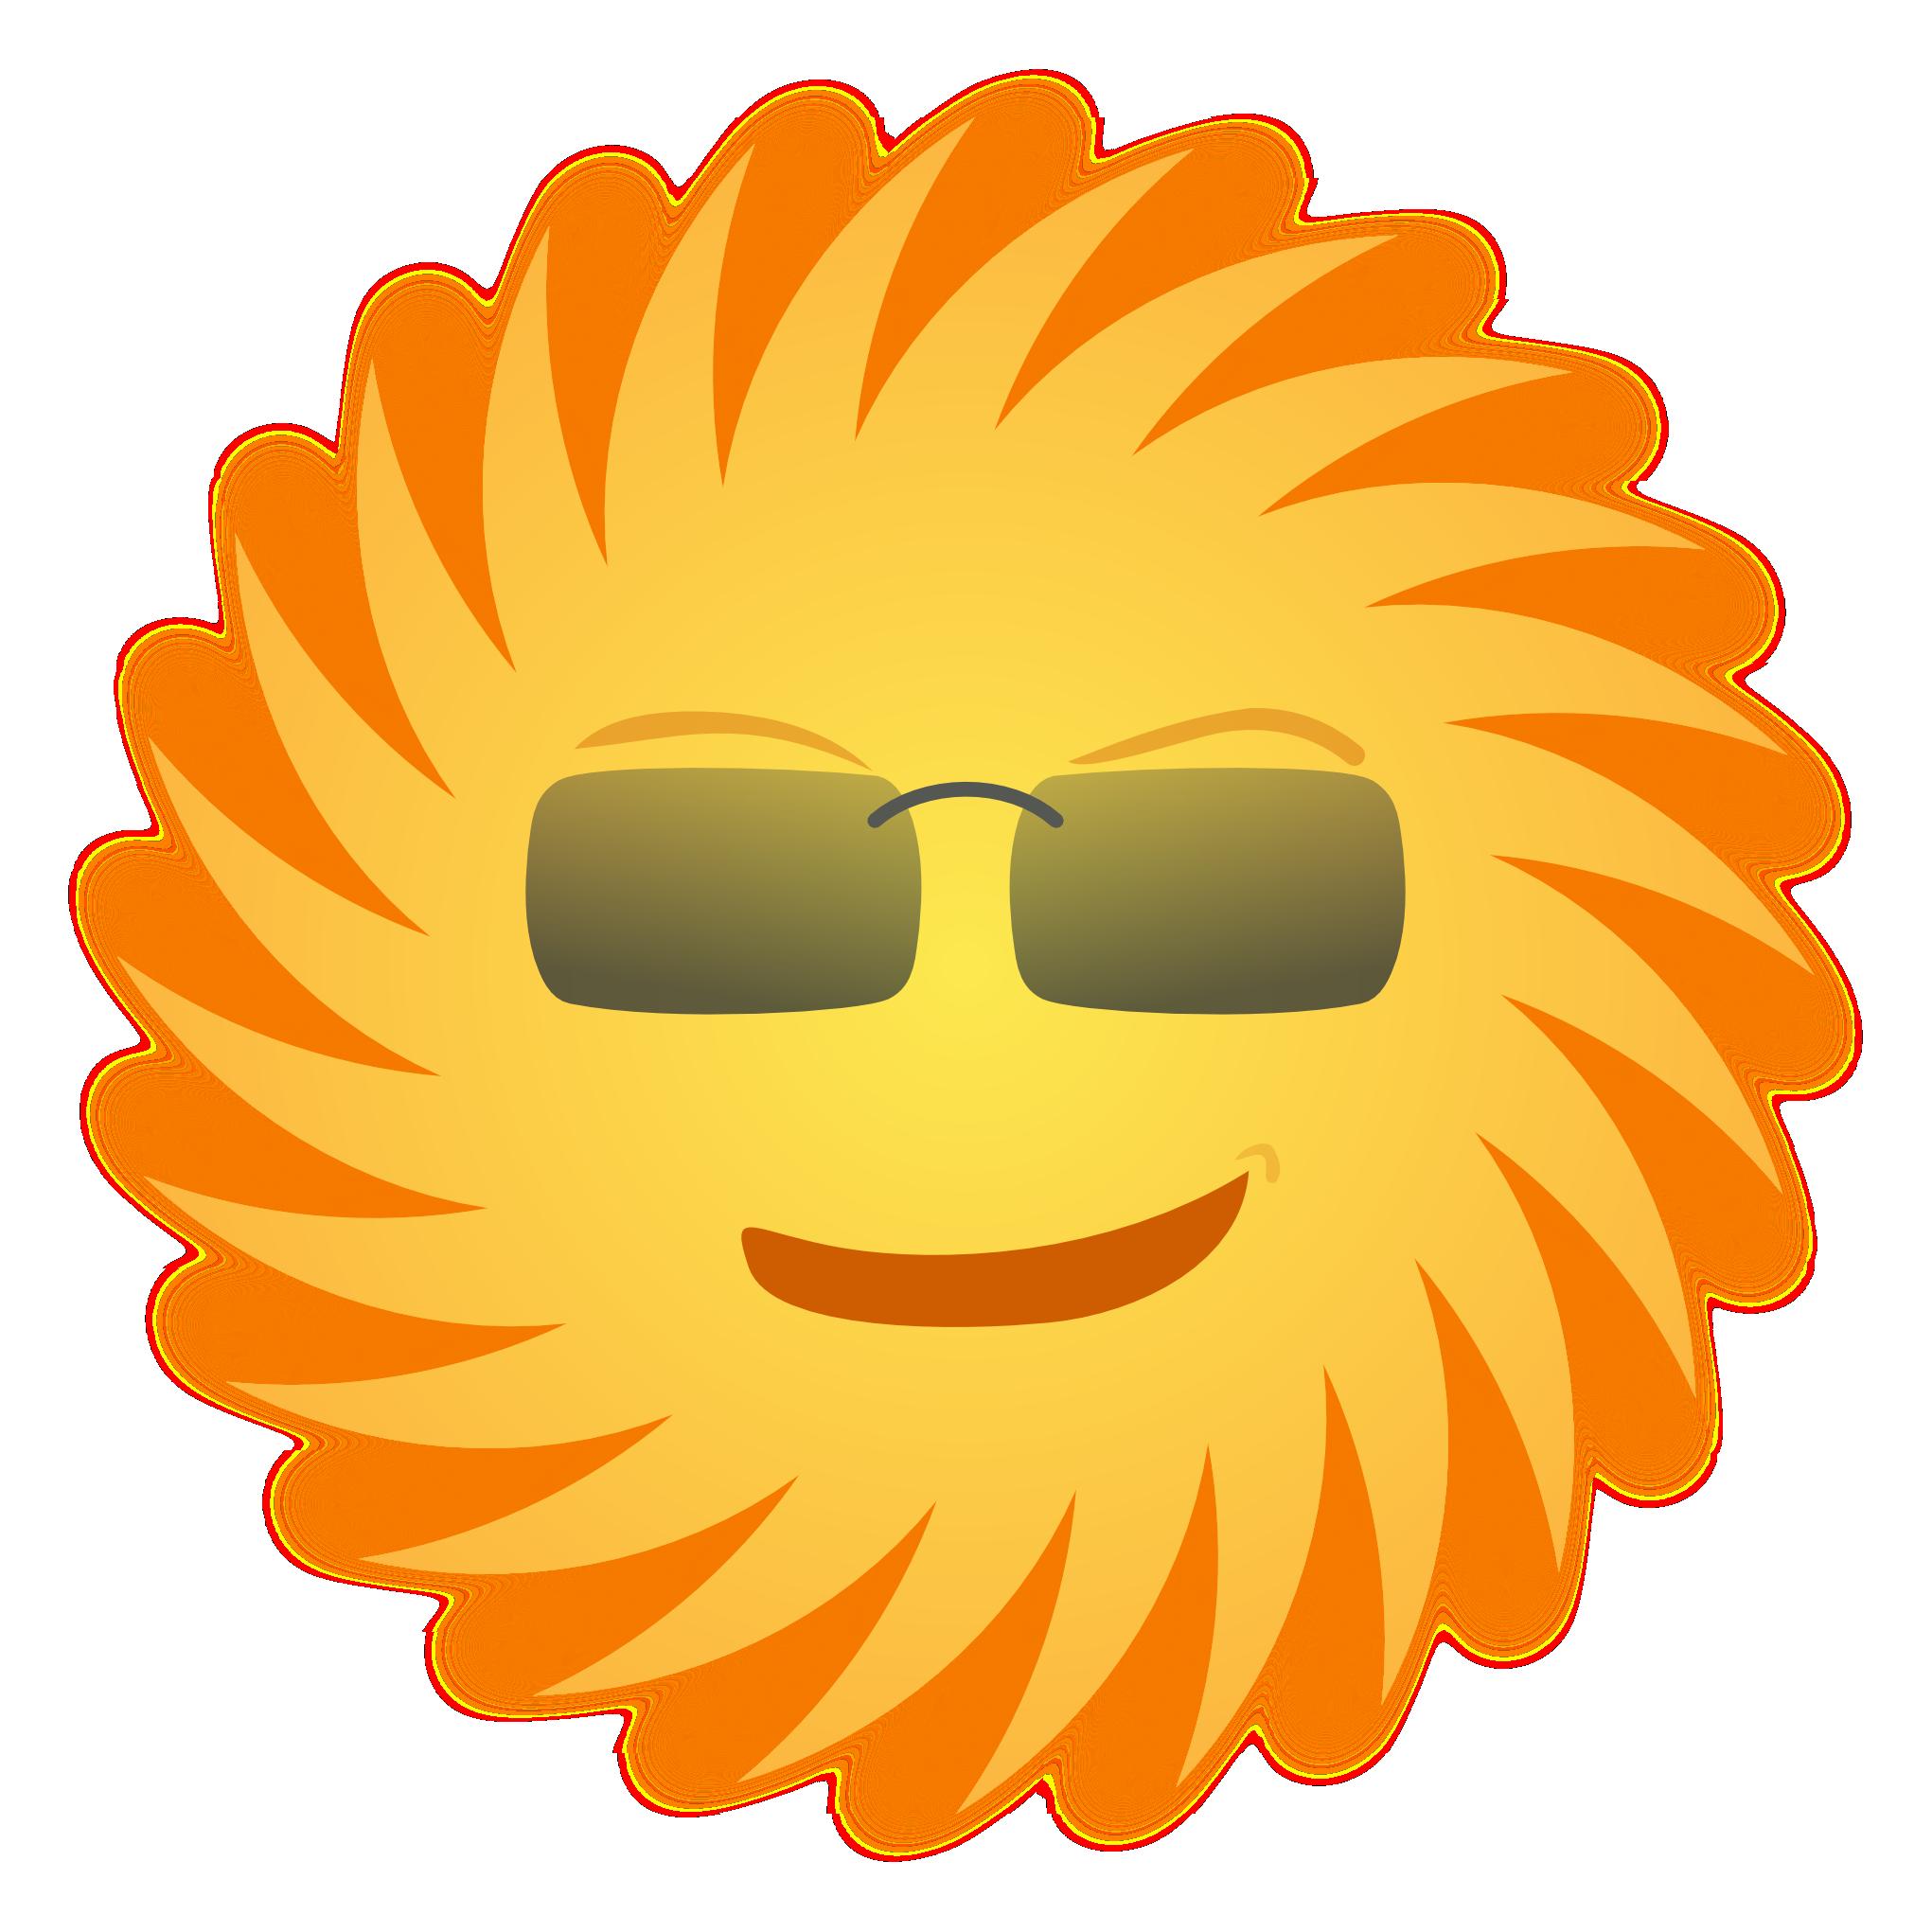 Sun PNG Image